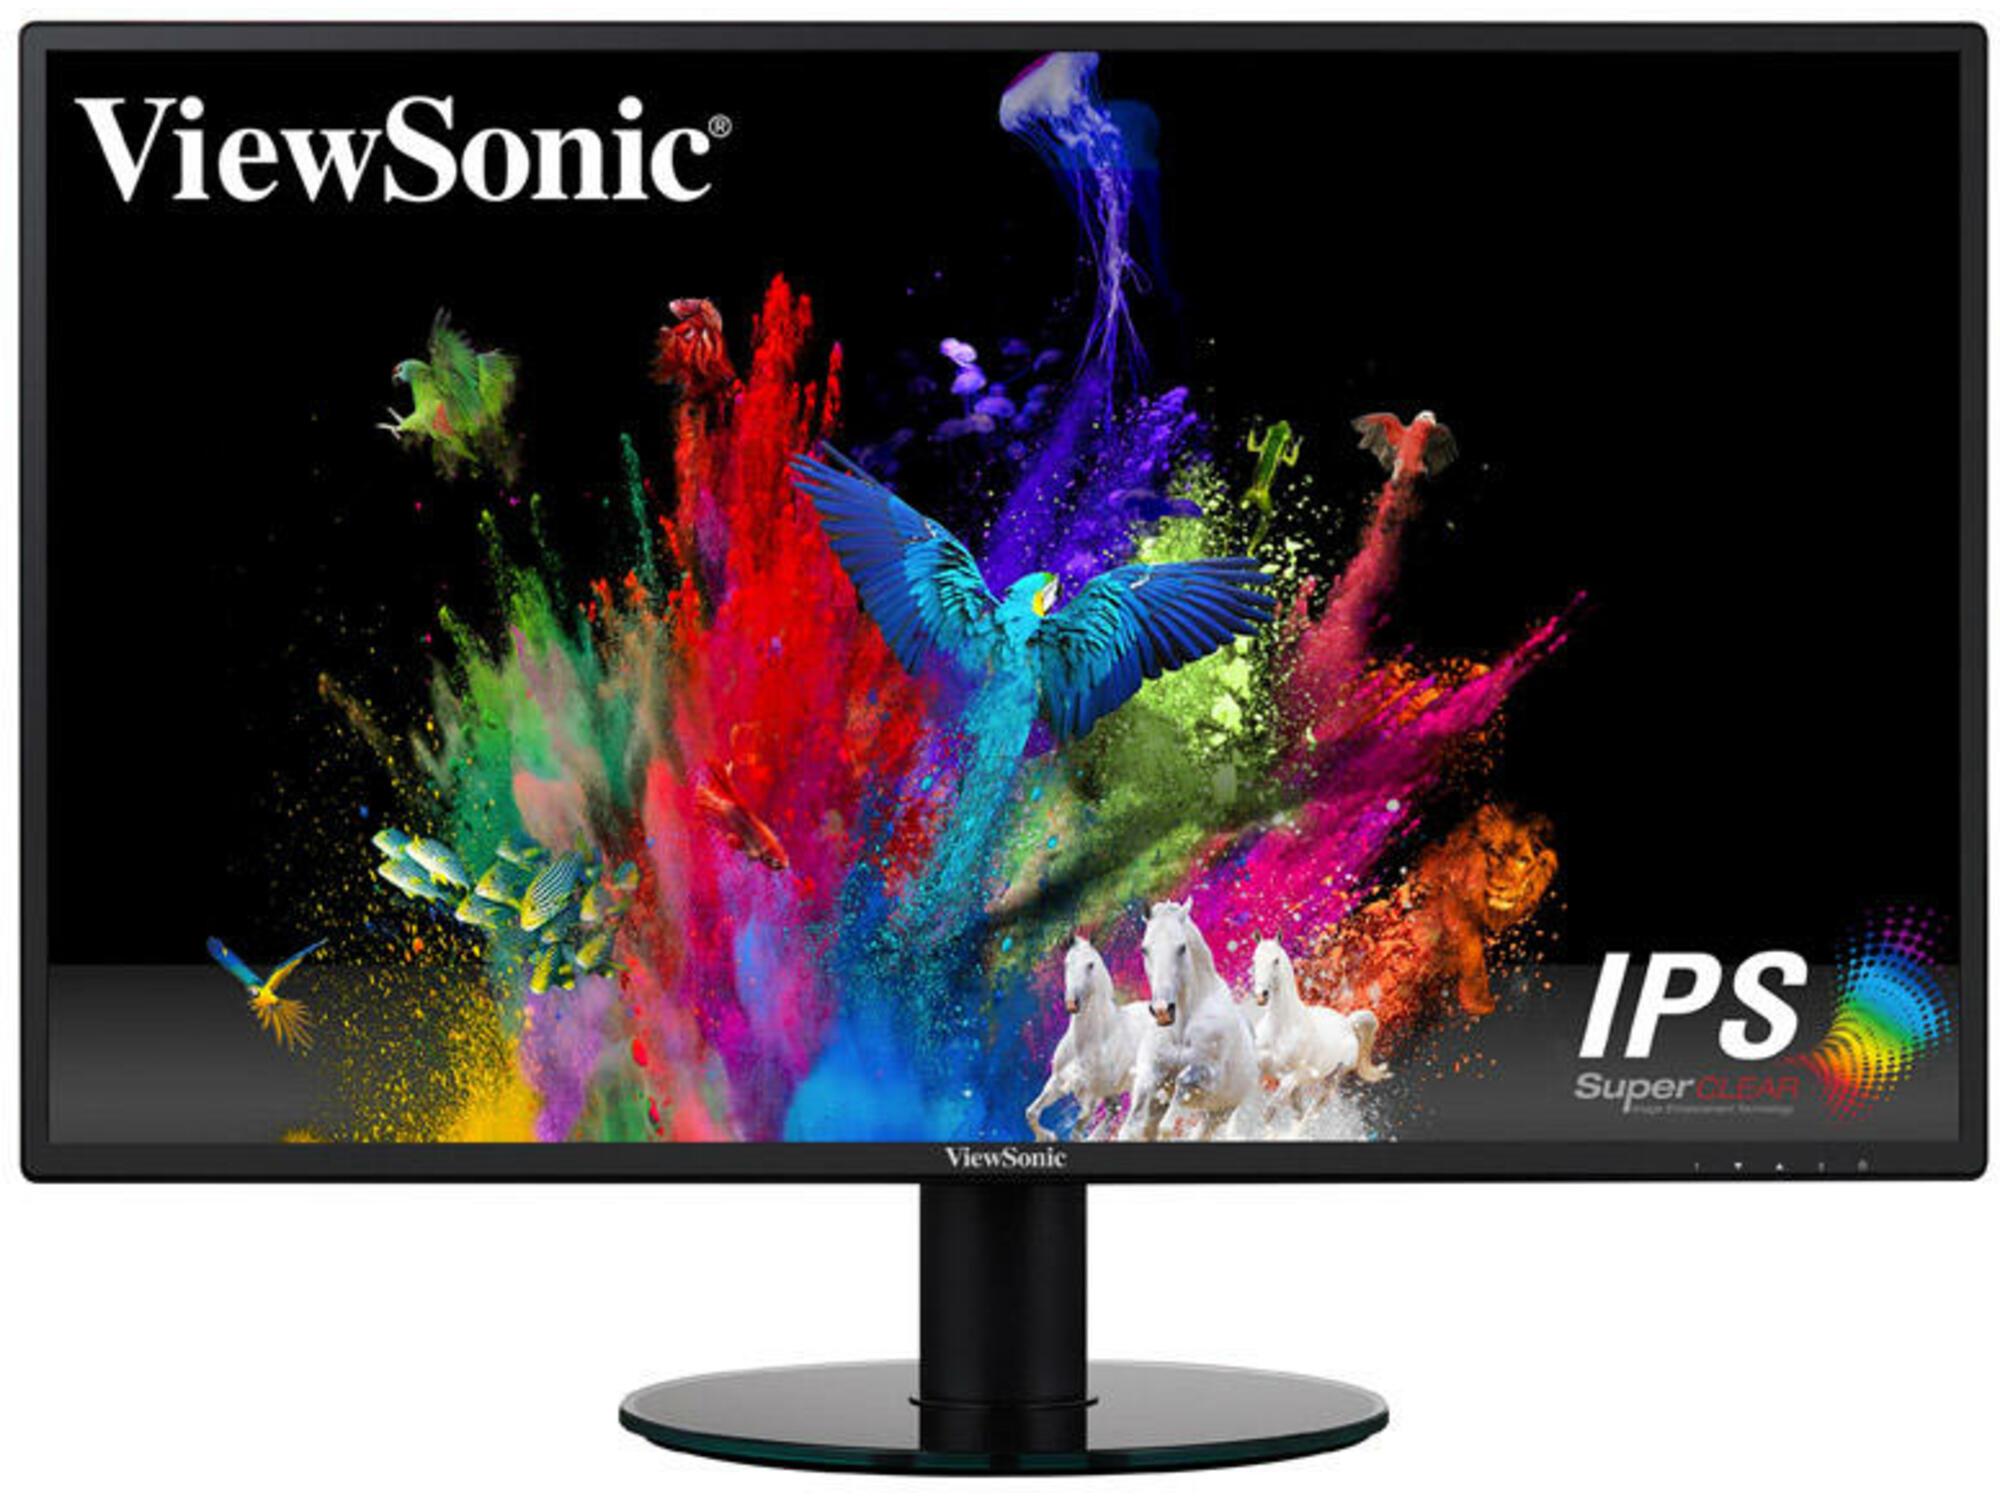 VIEWSONIC  VIEWSONIC VA2719-2K-SMHD 27' IPS LED LCD monitor DP/HDMI